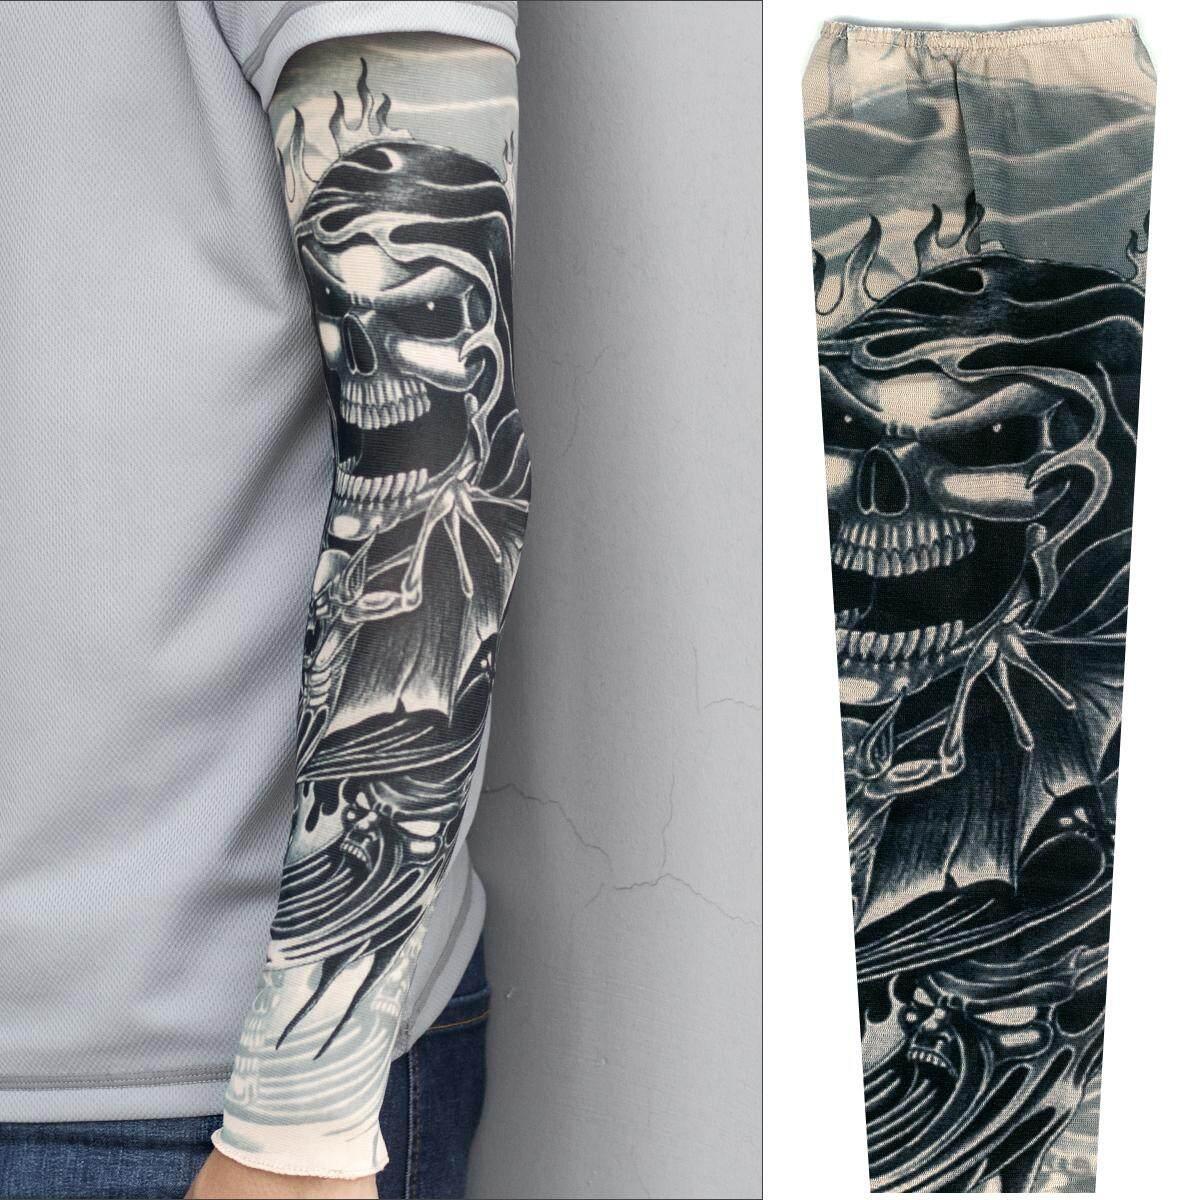 Nilon Stoking Lengan Anak Anak Sementara Lengan Tato Keren Tato Source · Male Cover Tattoo Oversleeve Sleeves